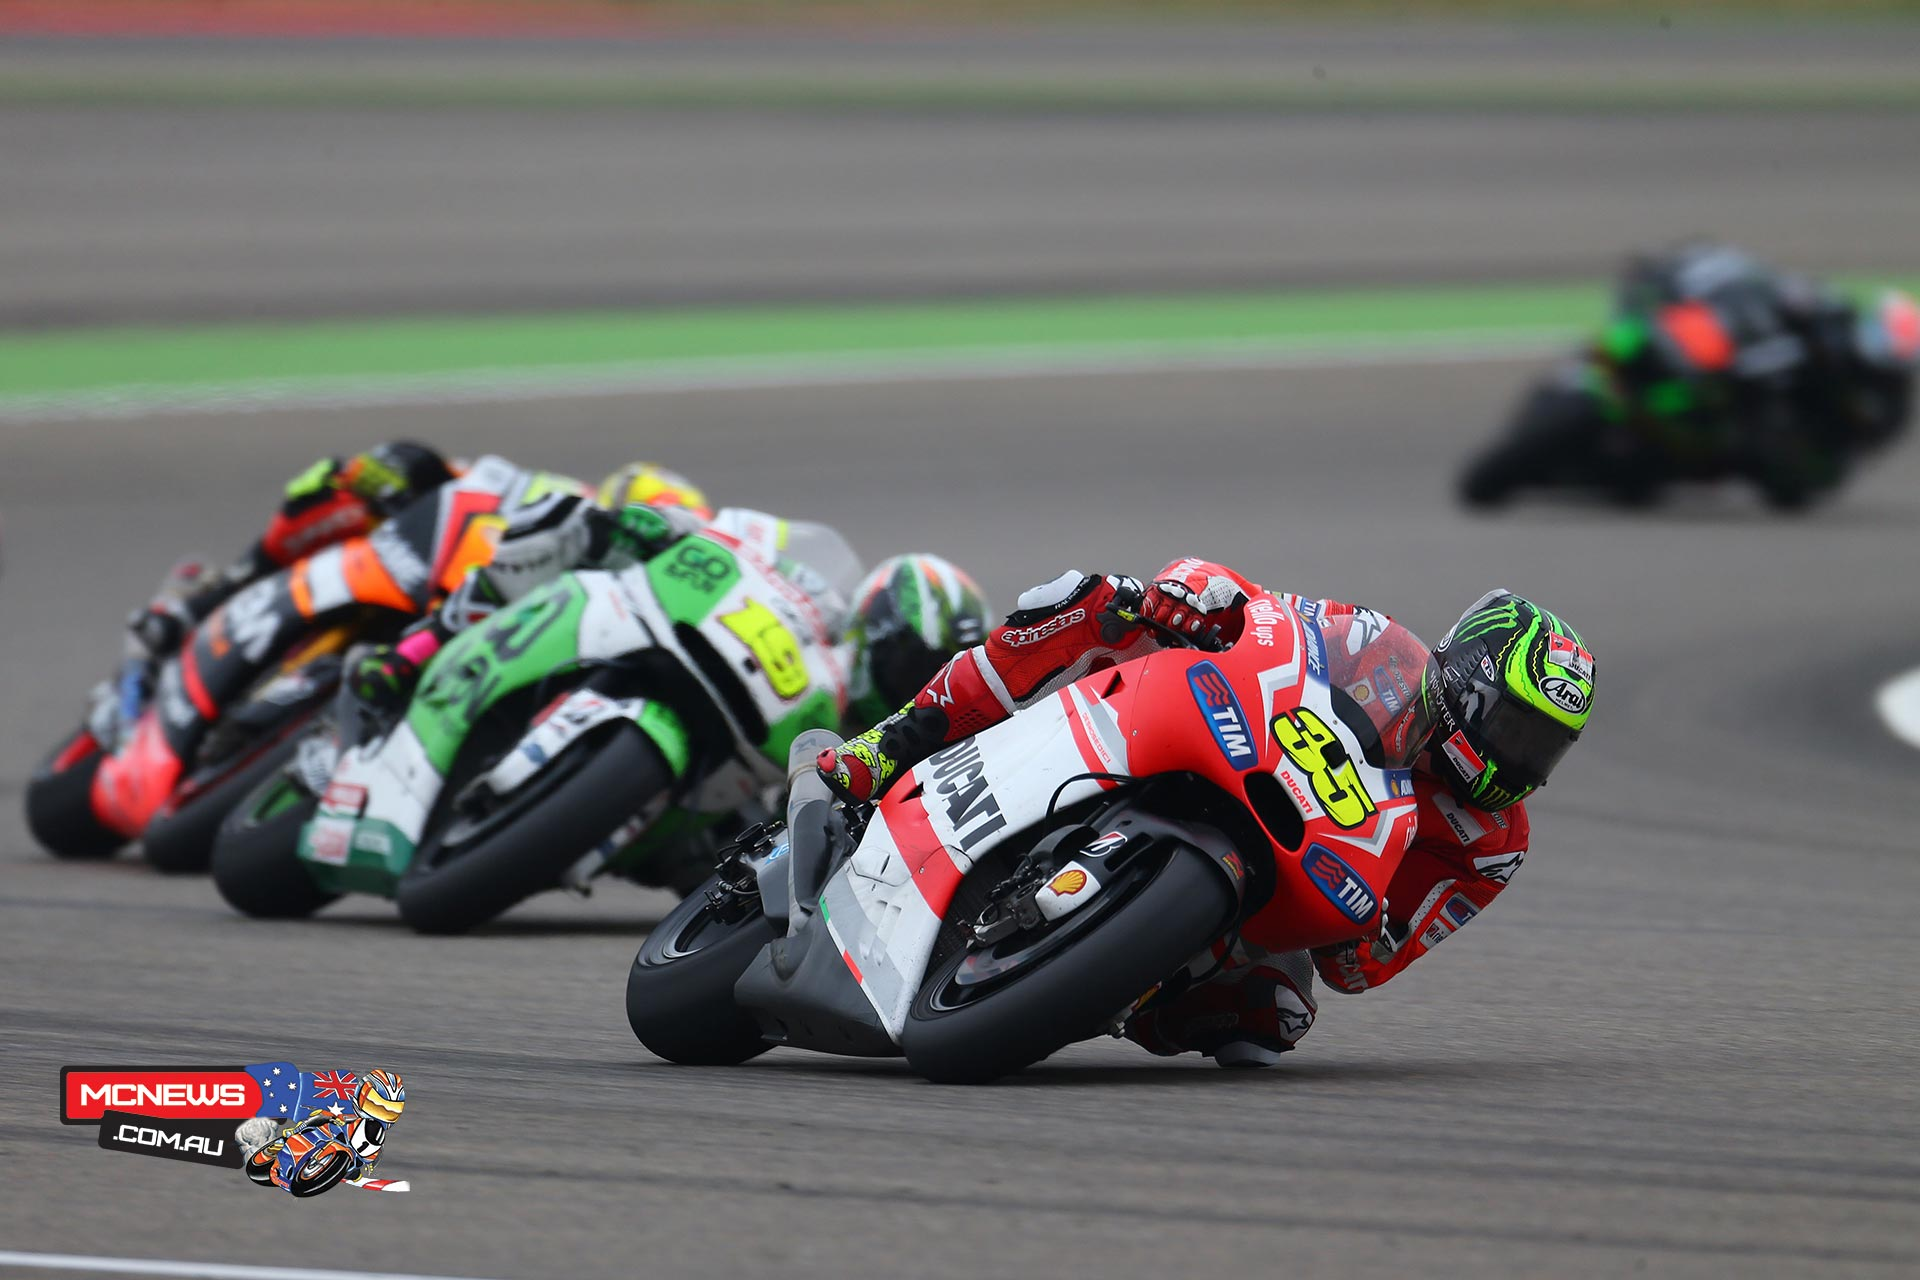 Cal Crutchlow Aragon MotoGP 2014